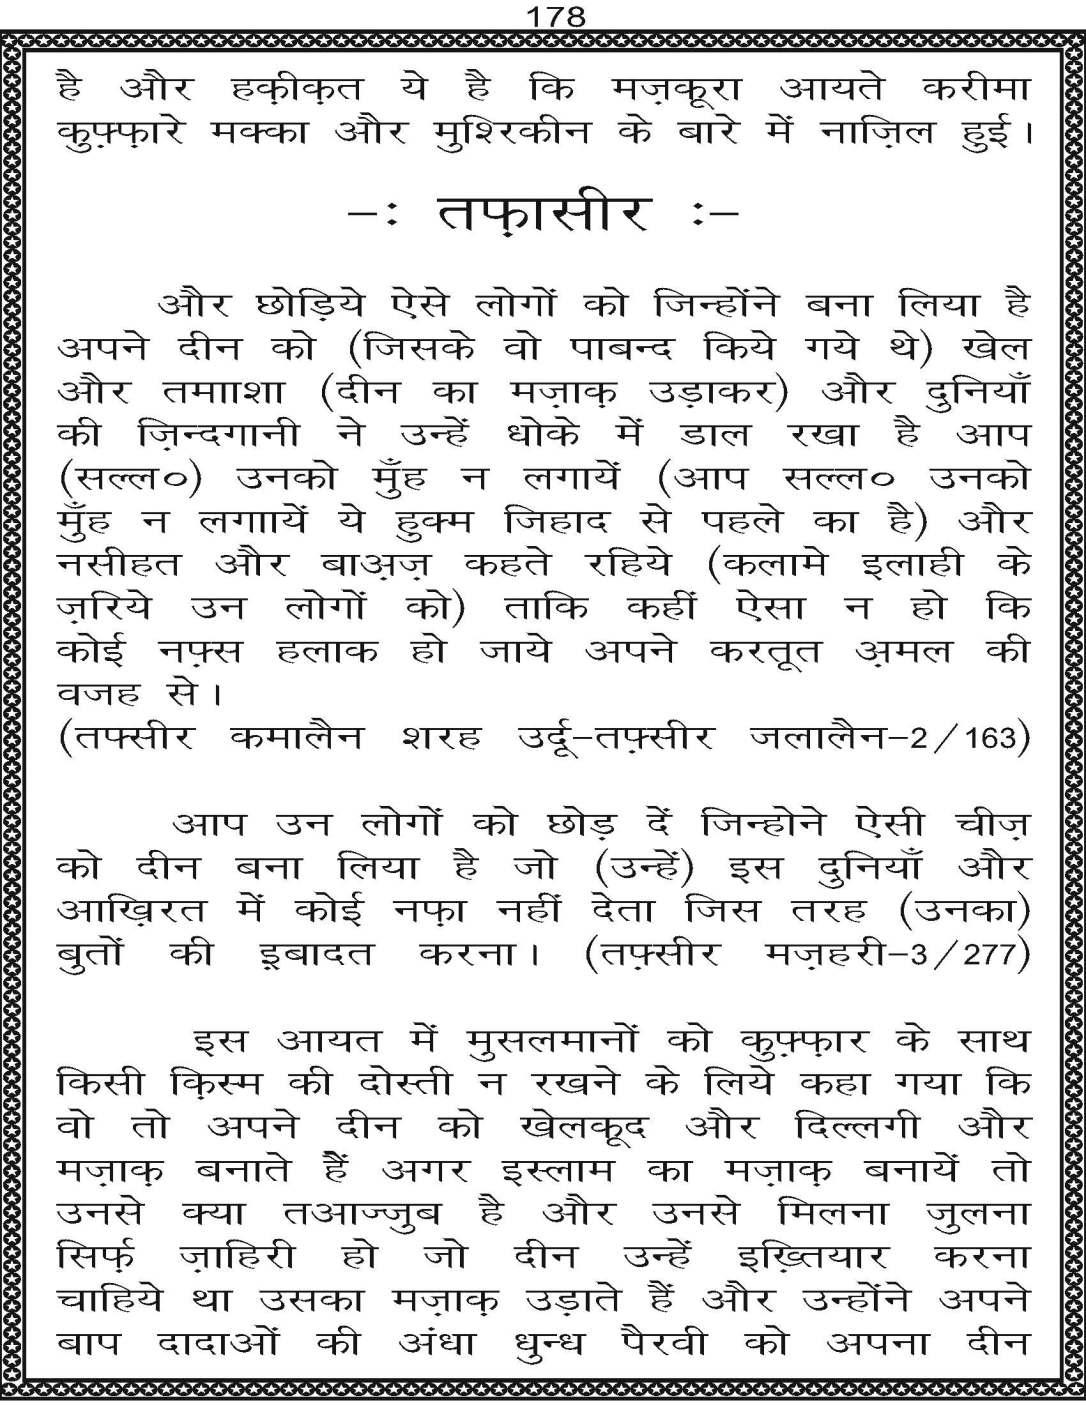 AzmateTaziyadari_Page_178